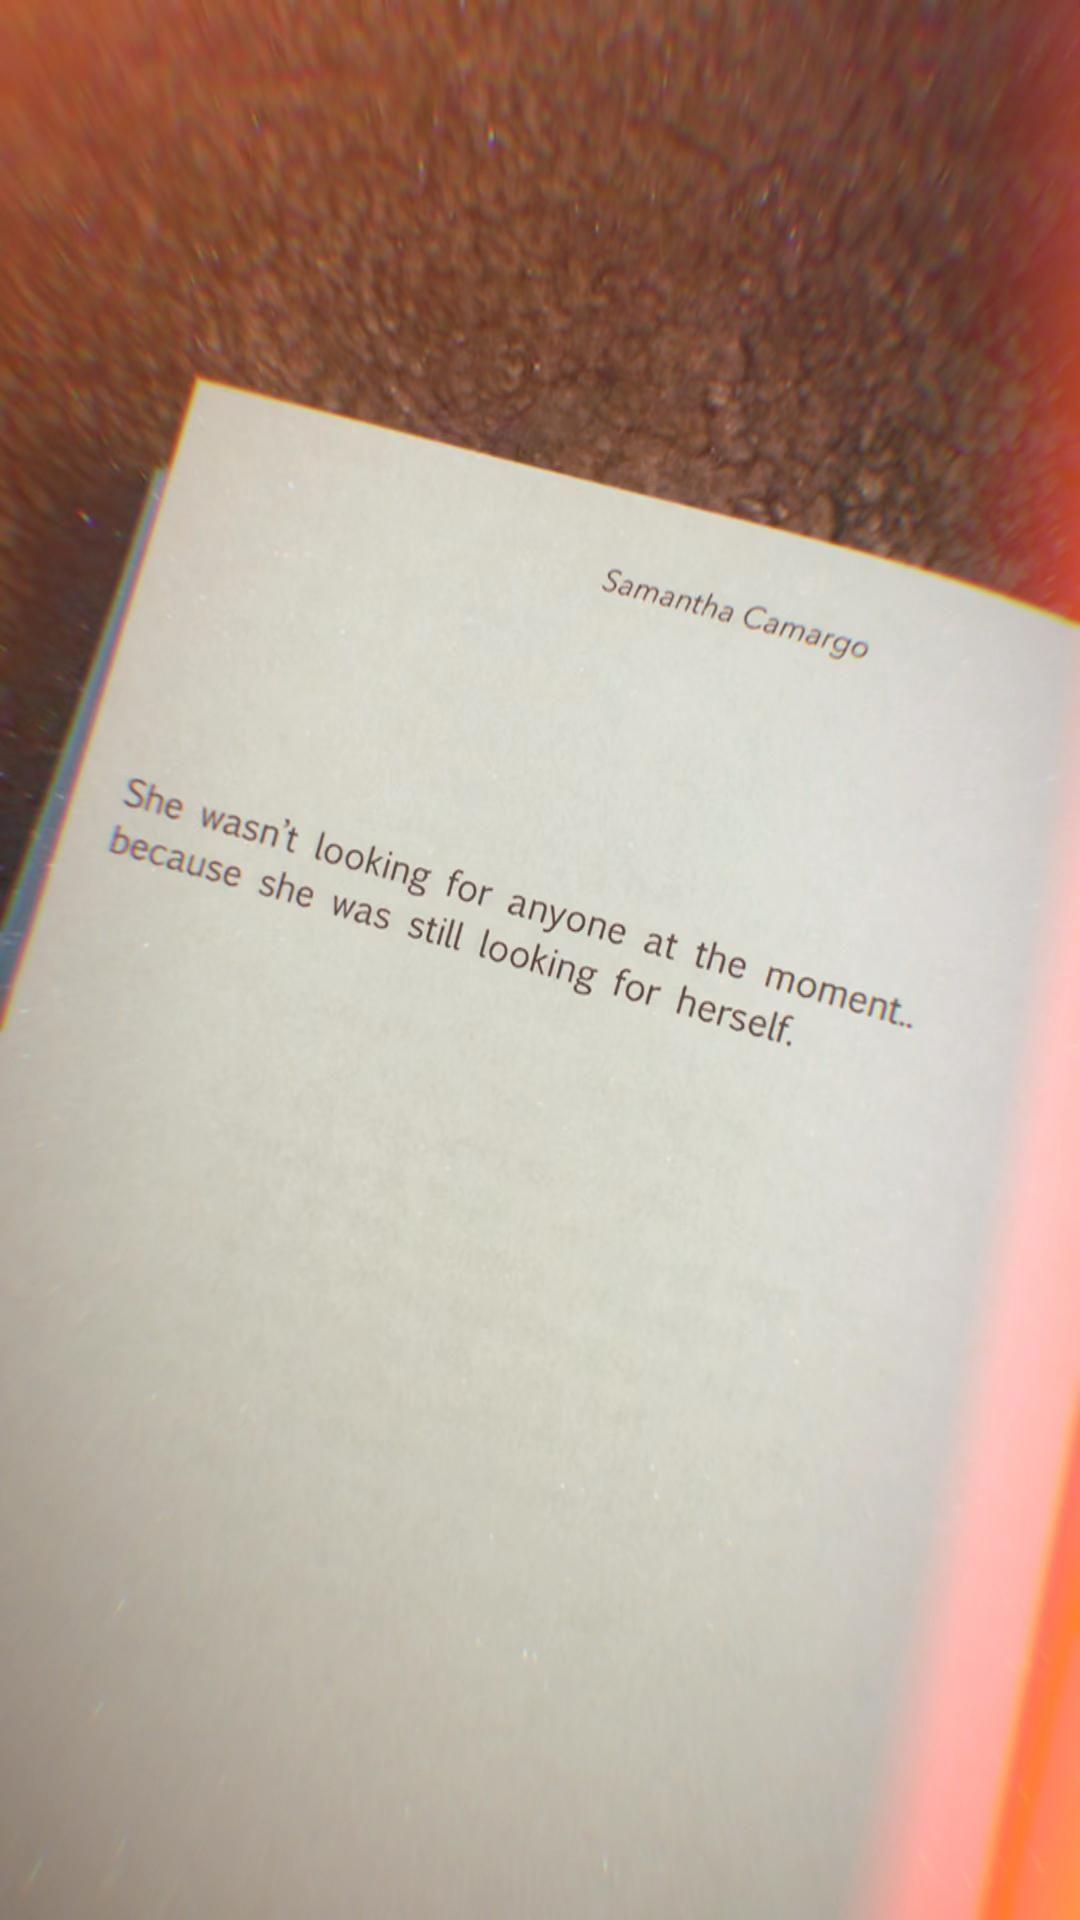 Night Drives: Camargo, Samantha: 9798647843883: Amazon.com: Books